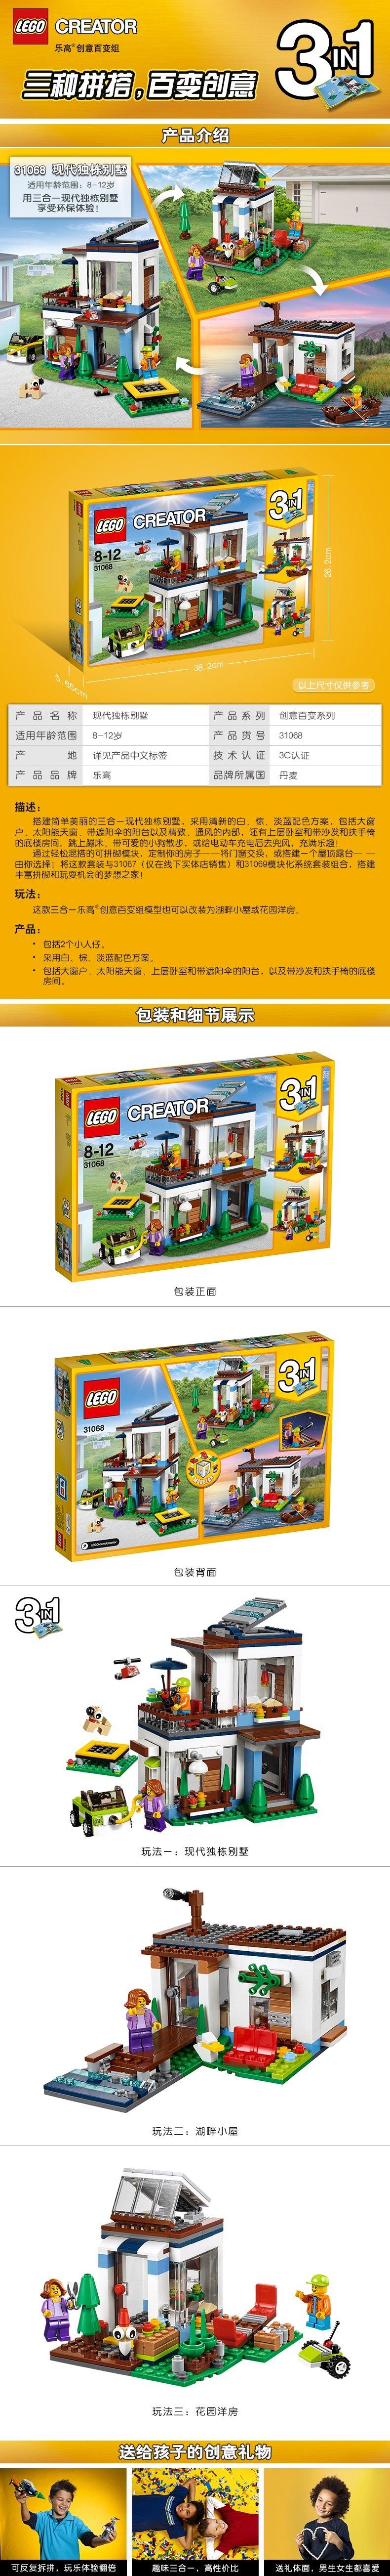 LEGO 乐高 Creator 创意百变系列 2017新品现代独栋别墅